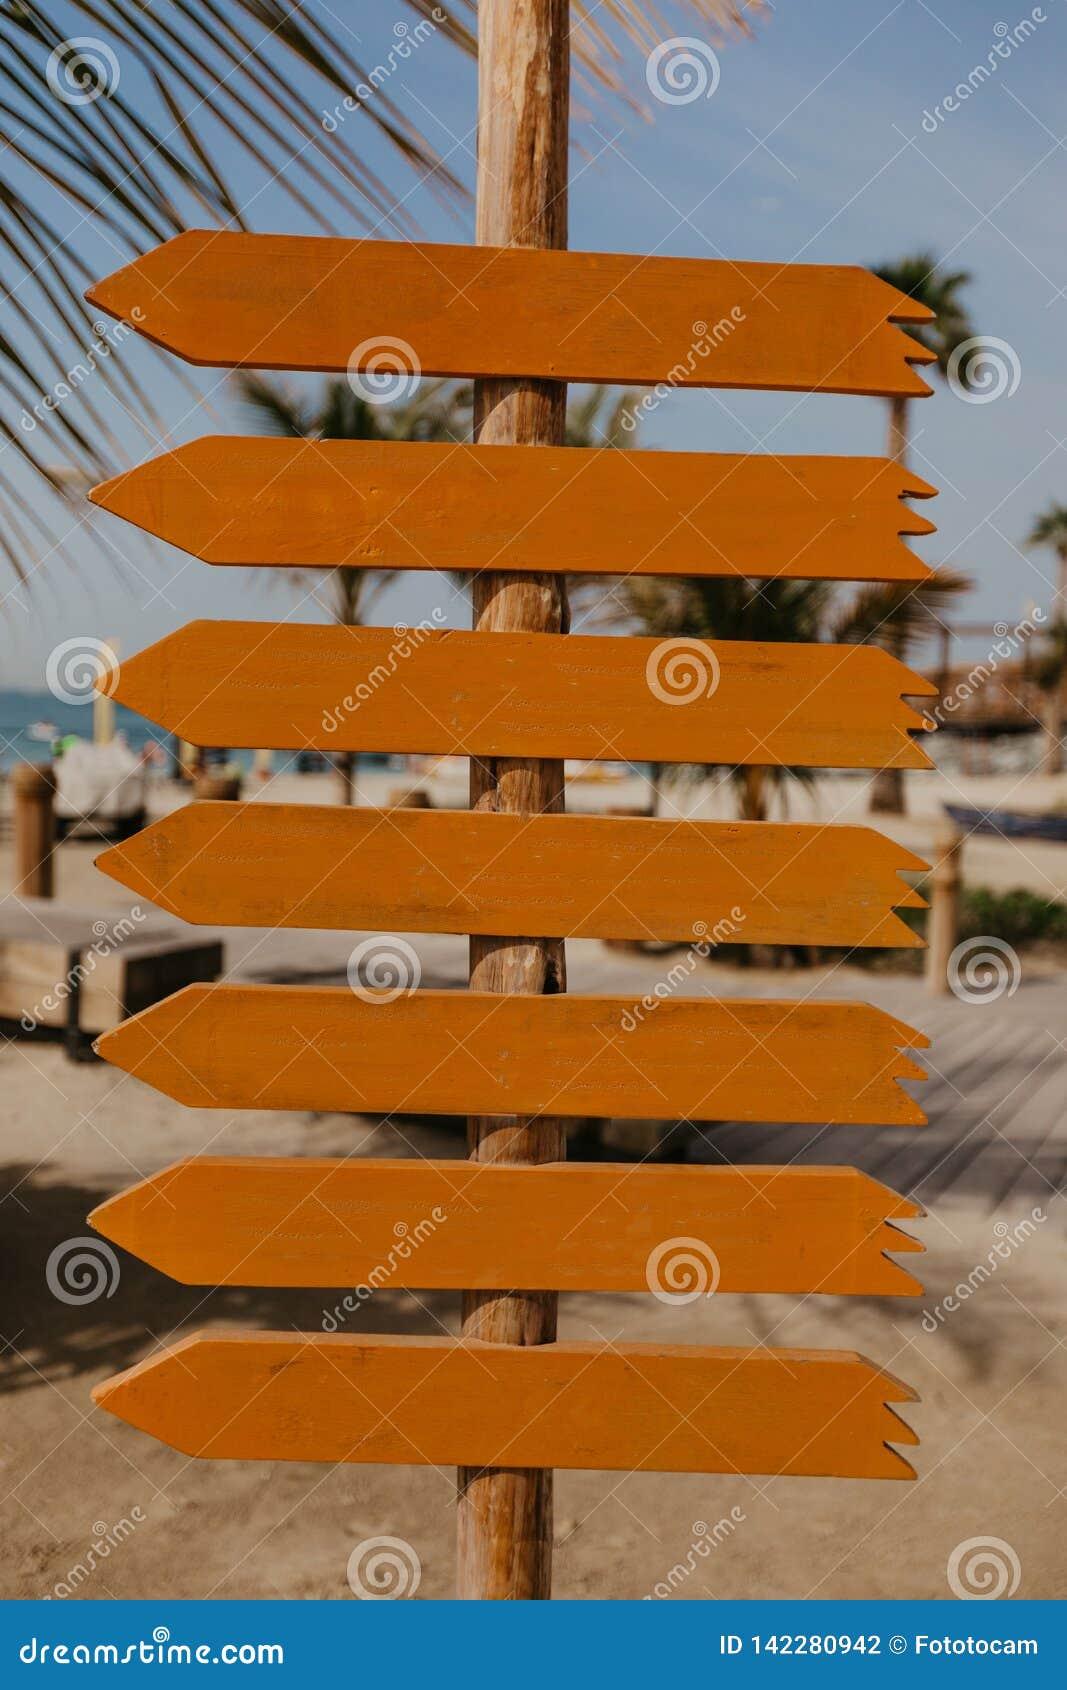 Set of orange wooden arrow pointers